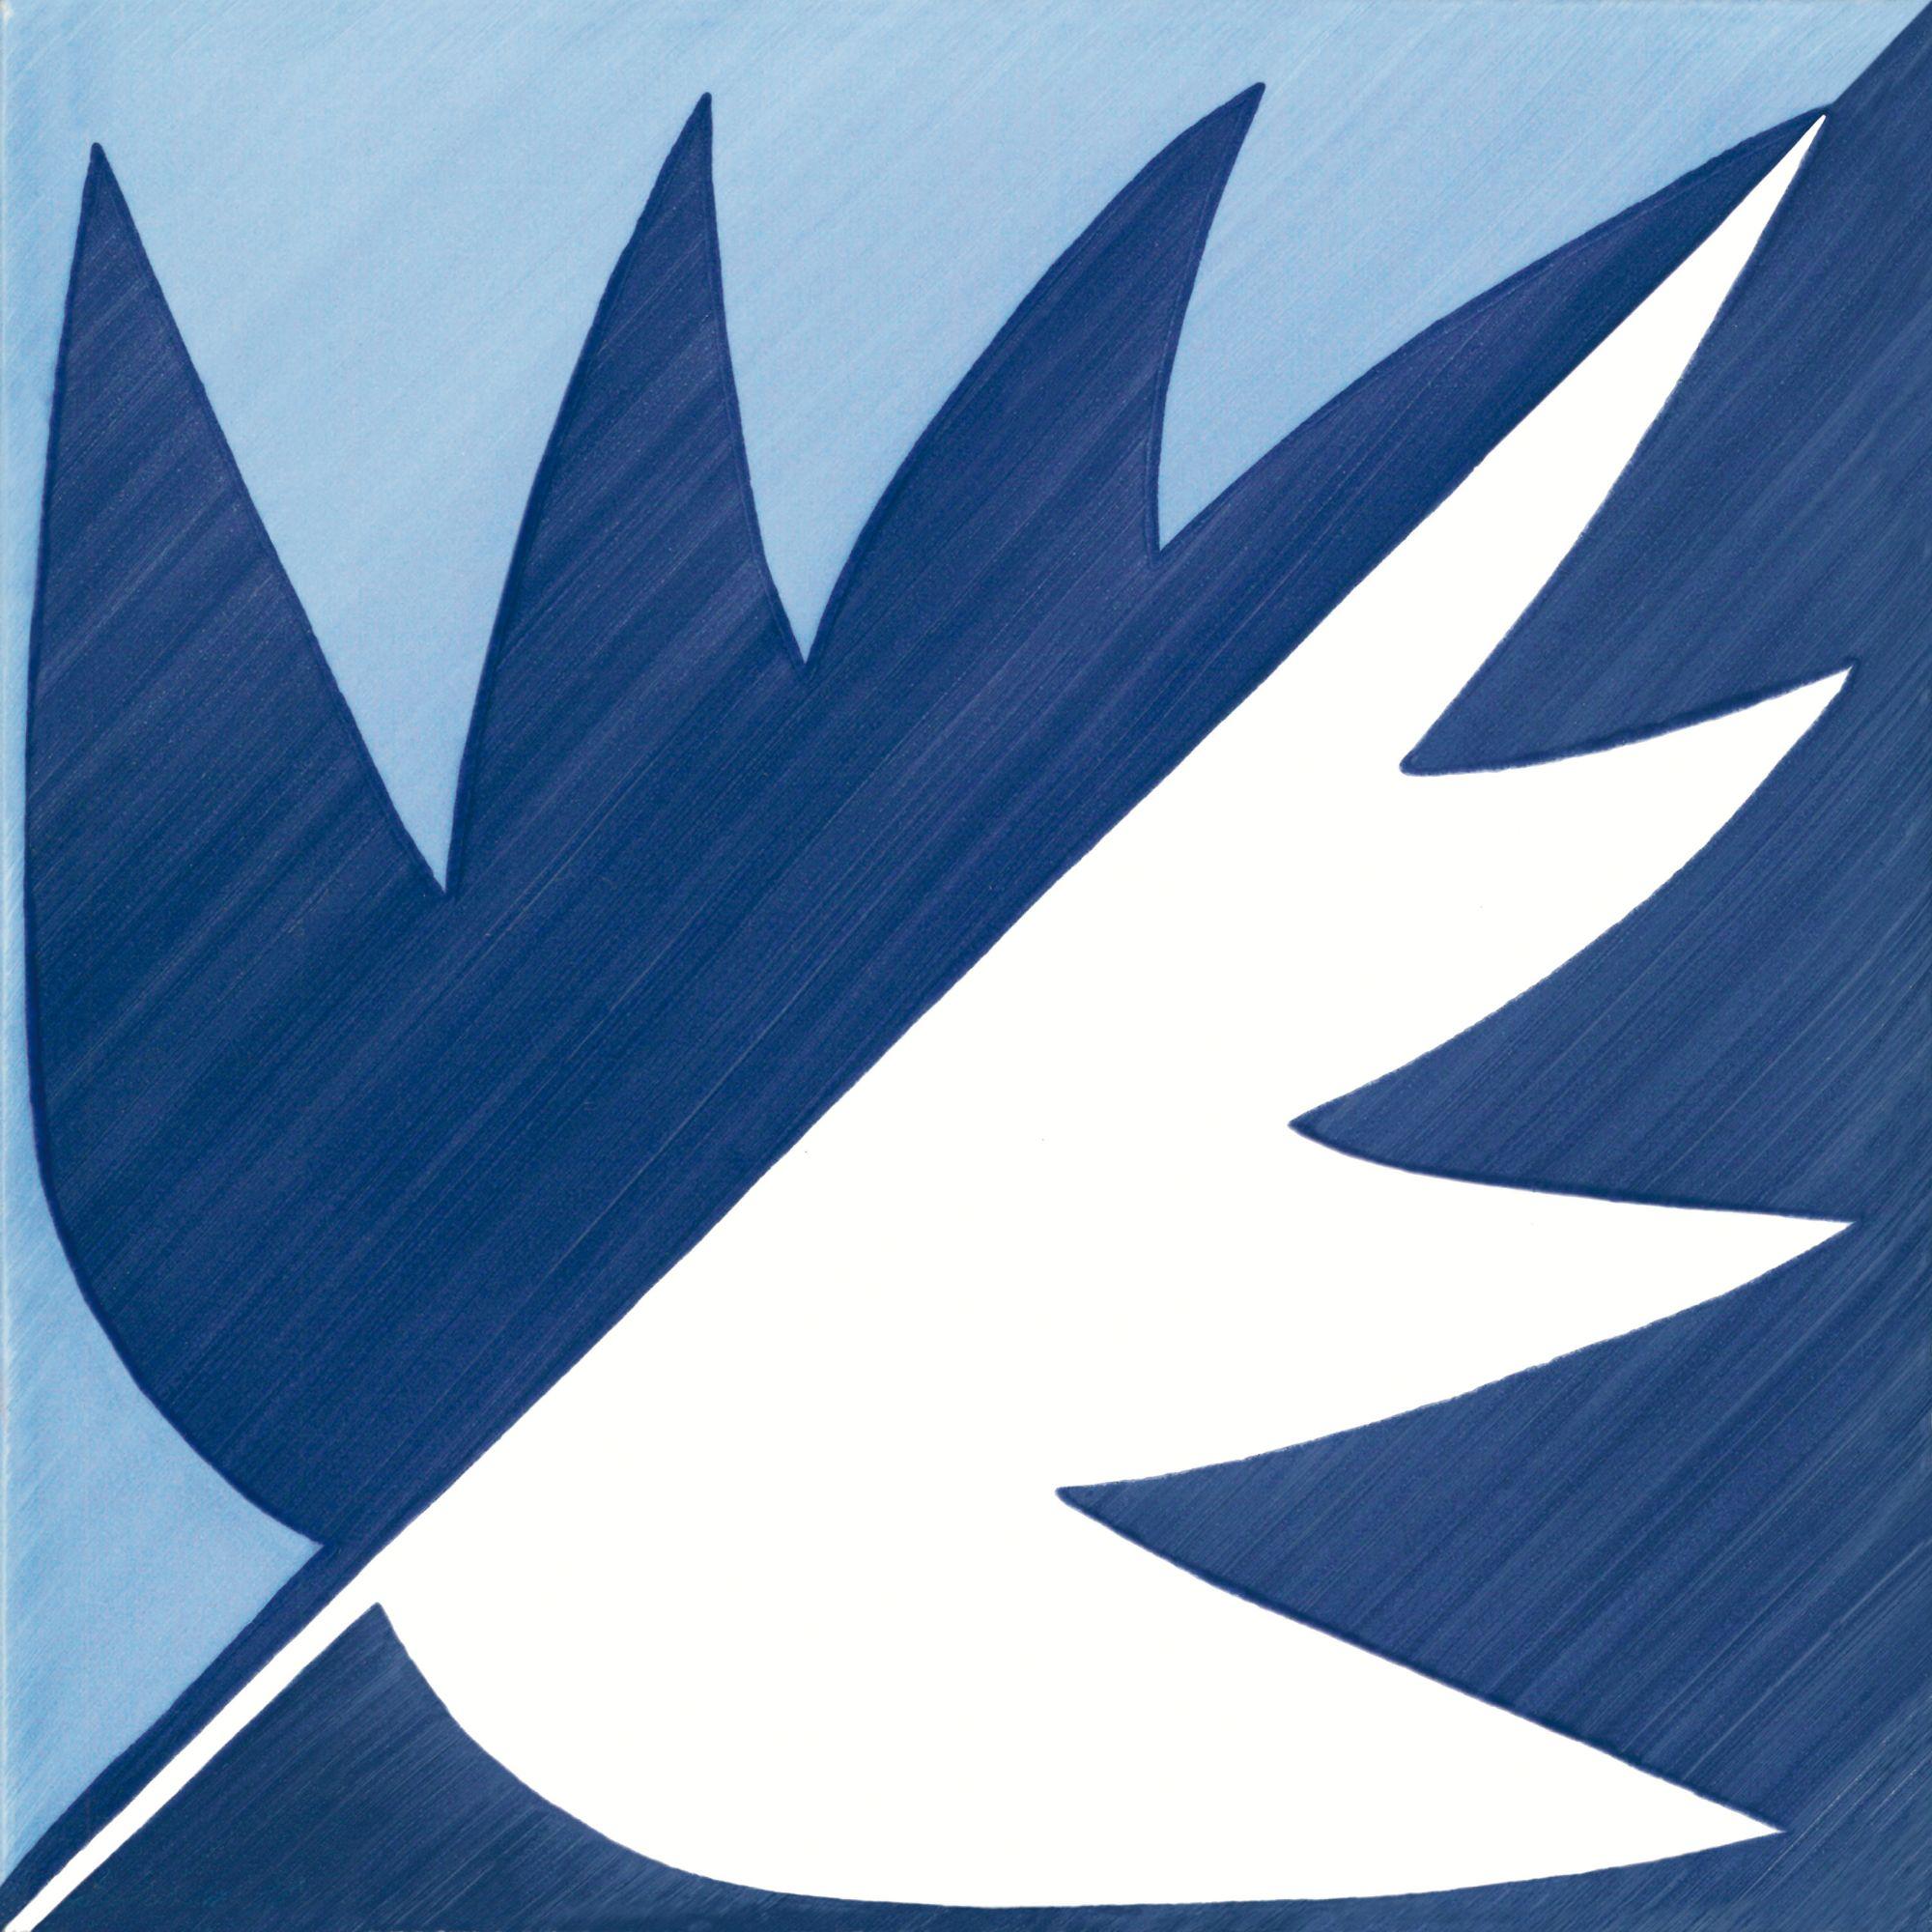 blu-ponti-decoro-tipo-29